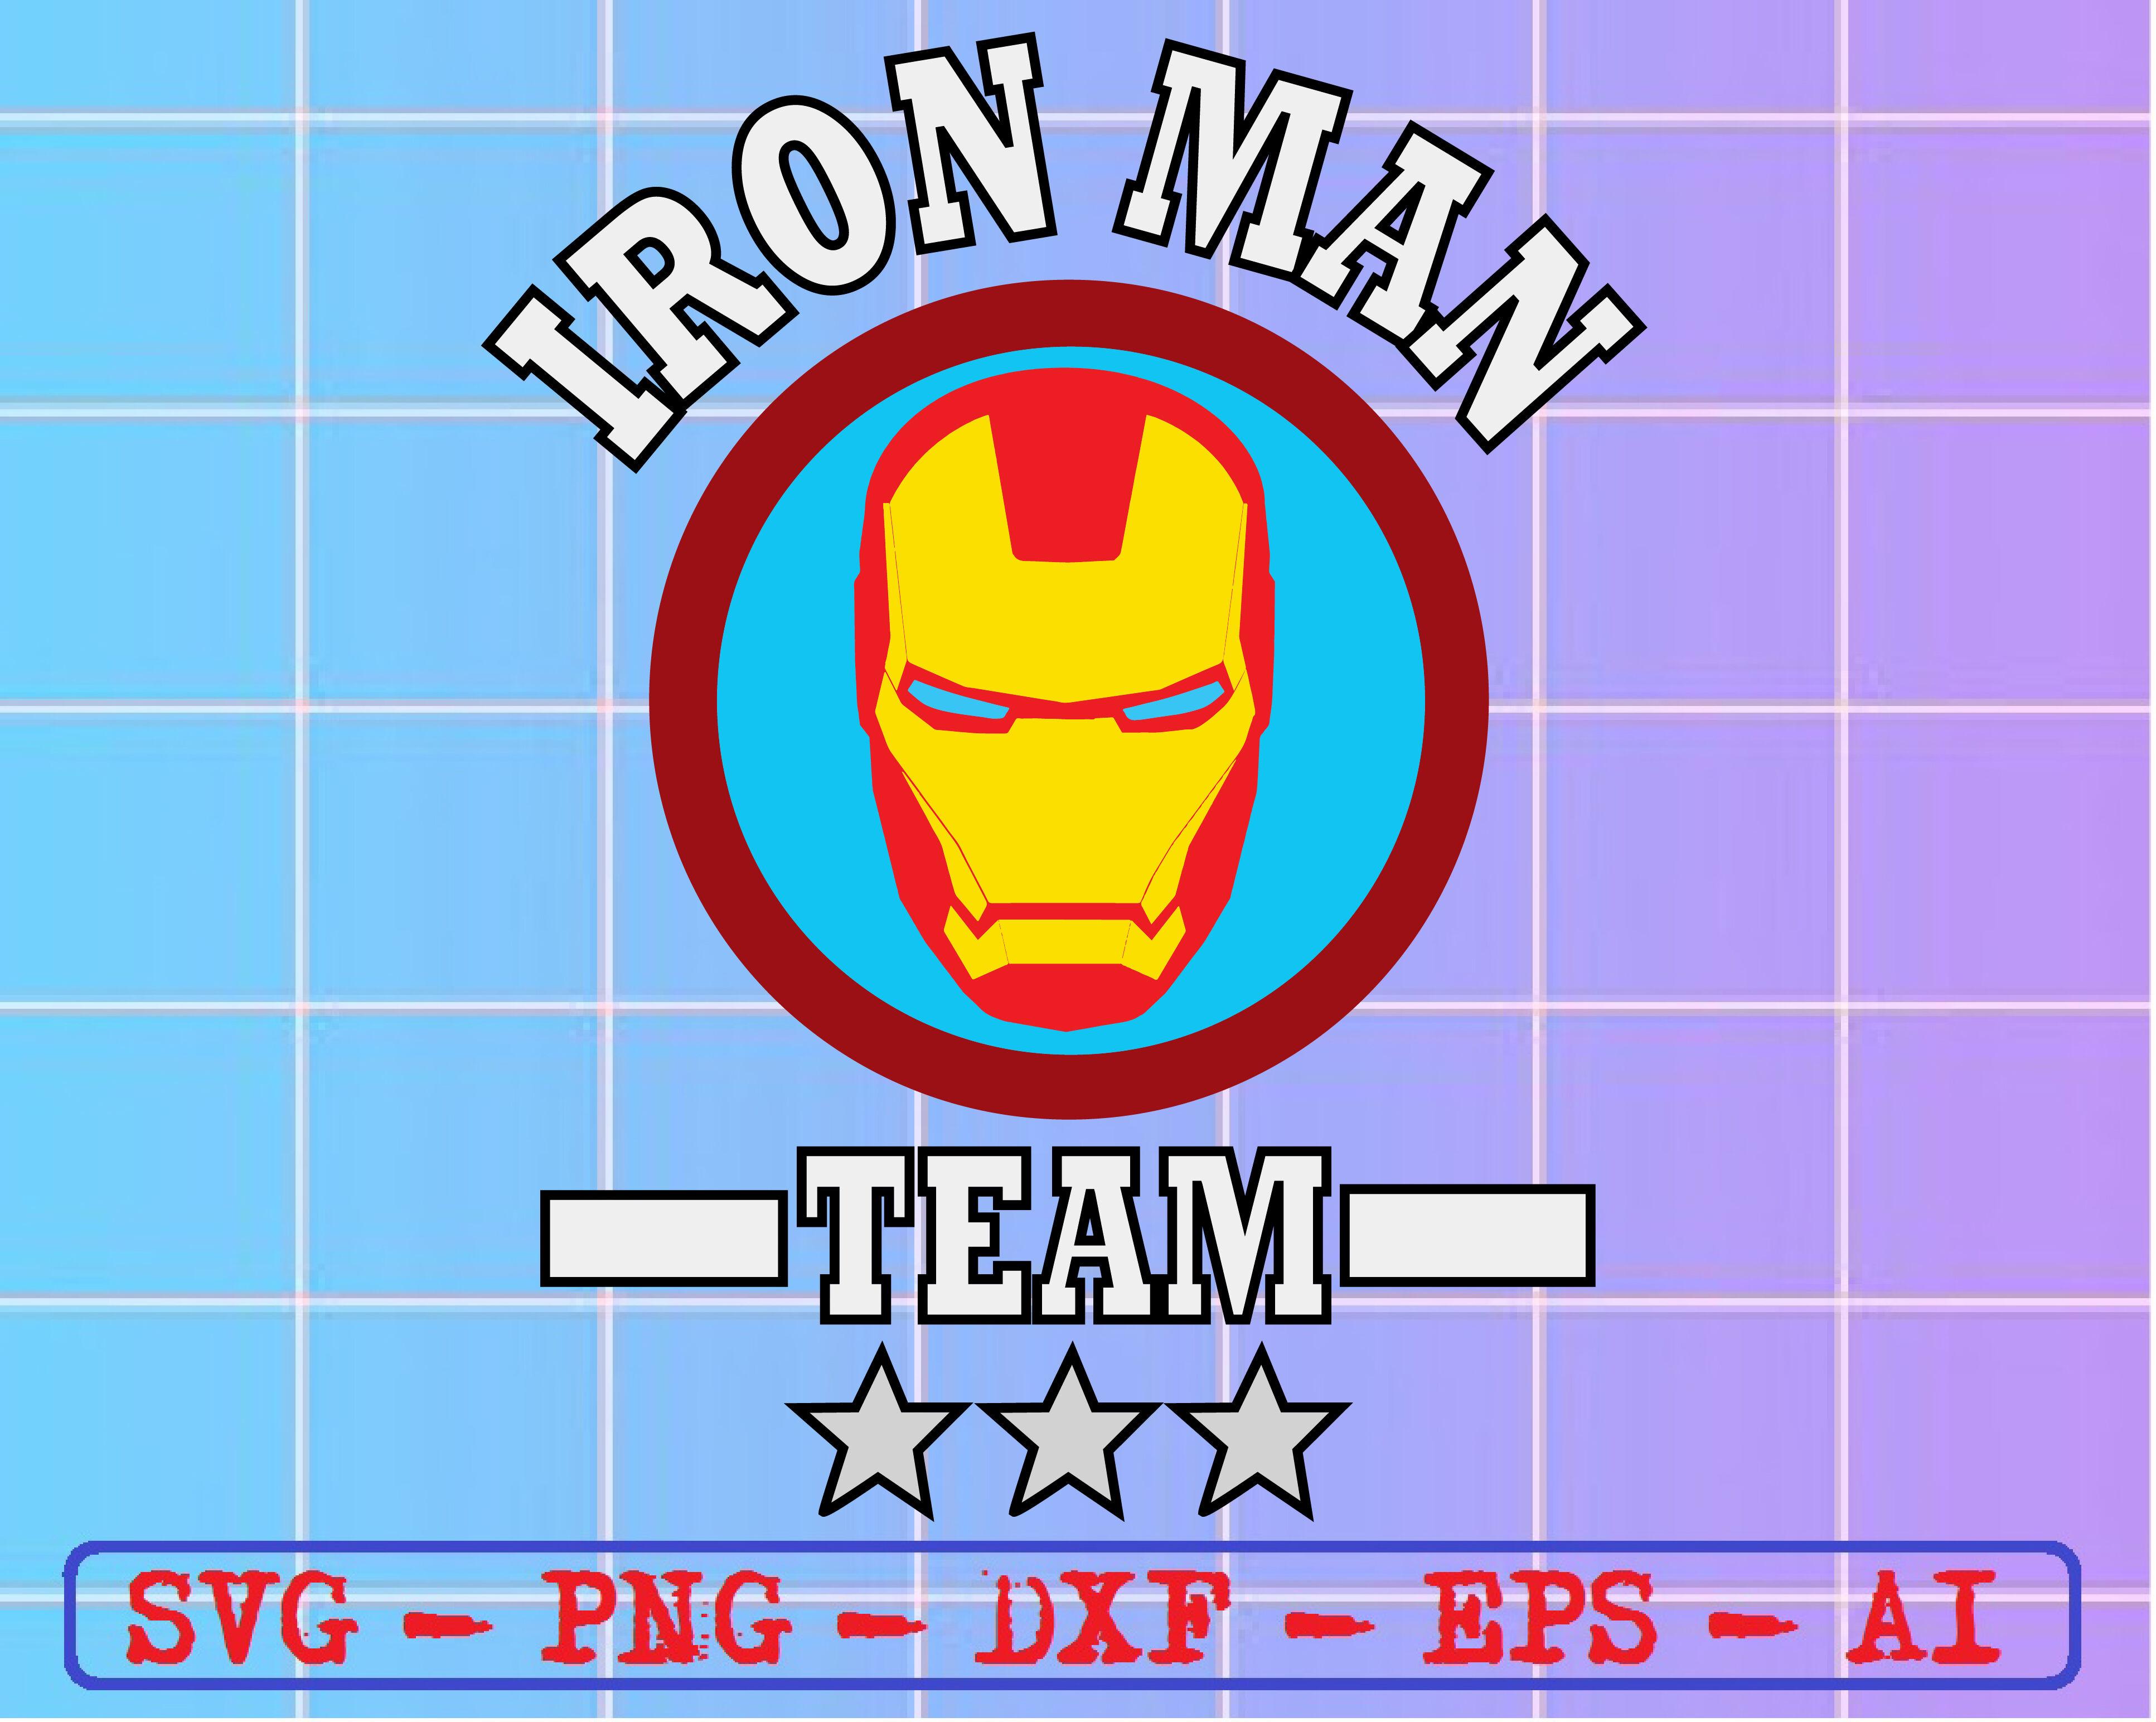 Iron Man Team Svg Dxf Eps Png Digital Download By Svgkiak